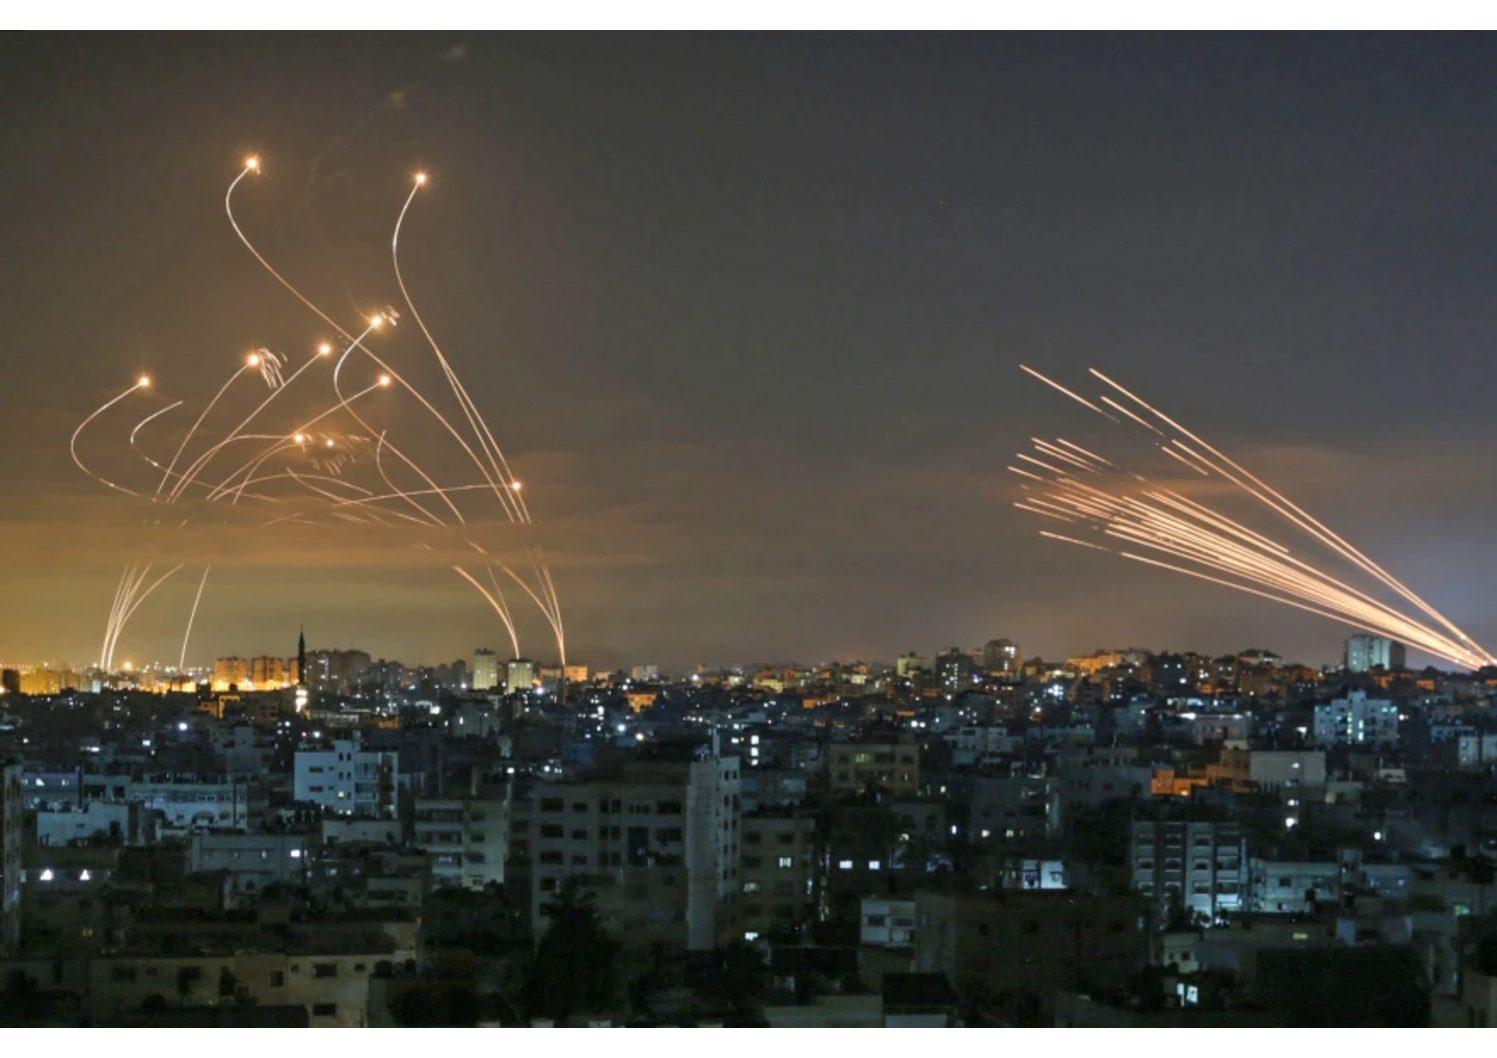 PALESTINE: Gaza-Israel: Letter to my Palestinian friend from Gaza